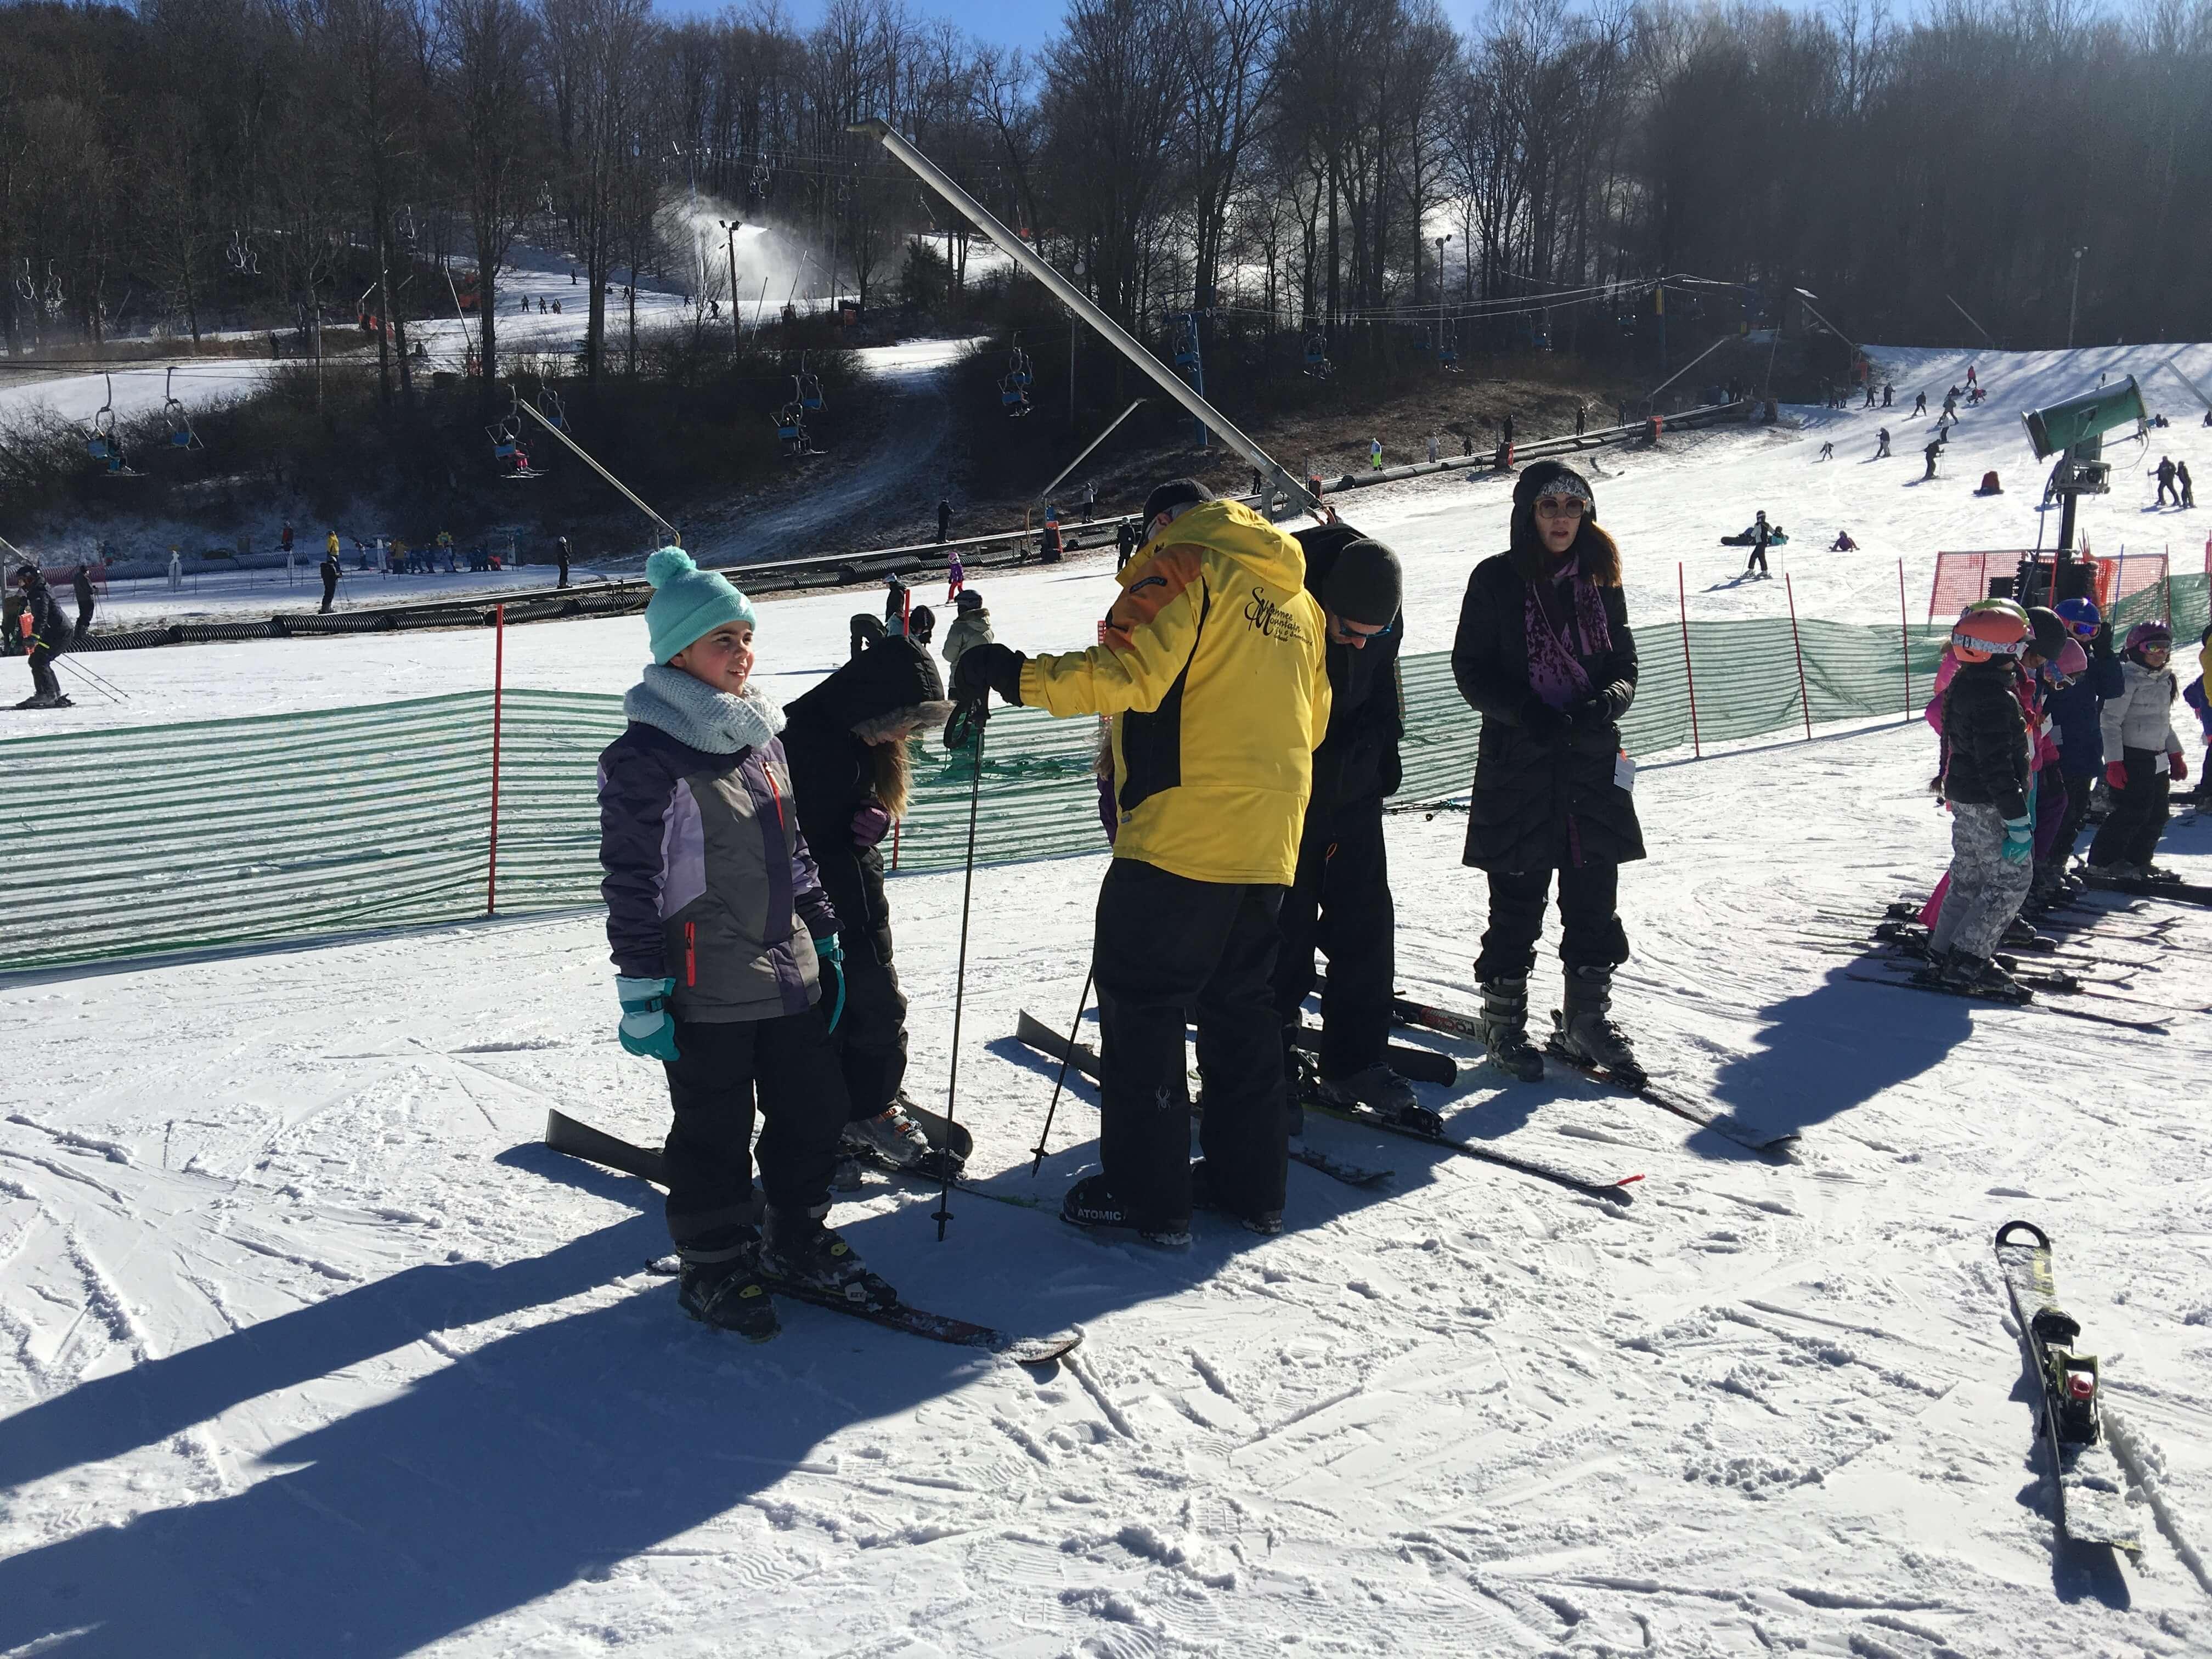 First-Time Skiing at Shawnee Mountain Ski Area learning to ski